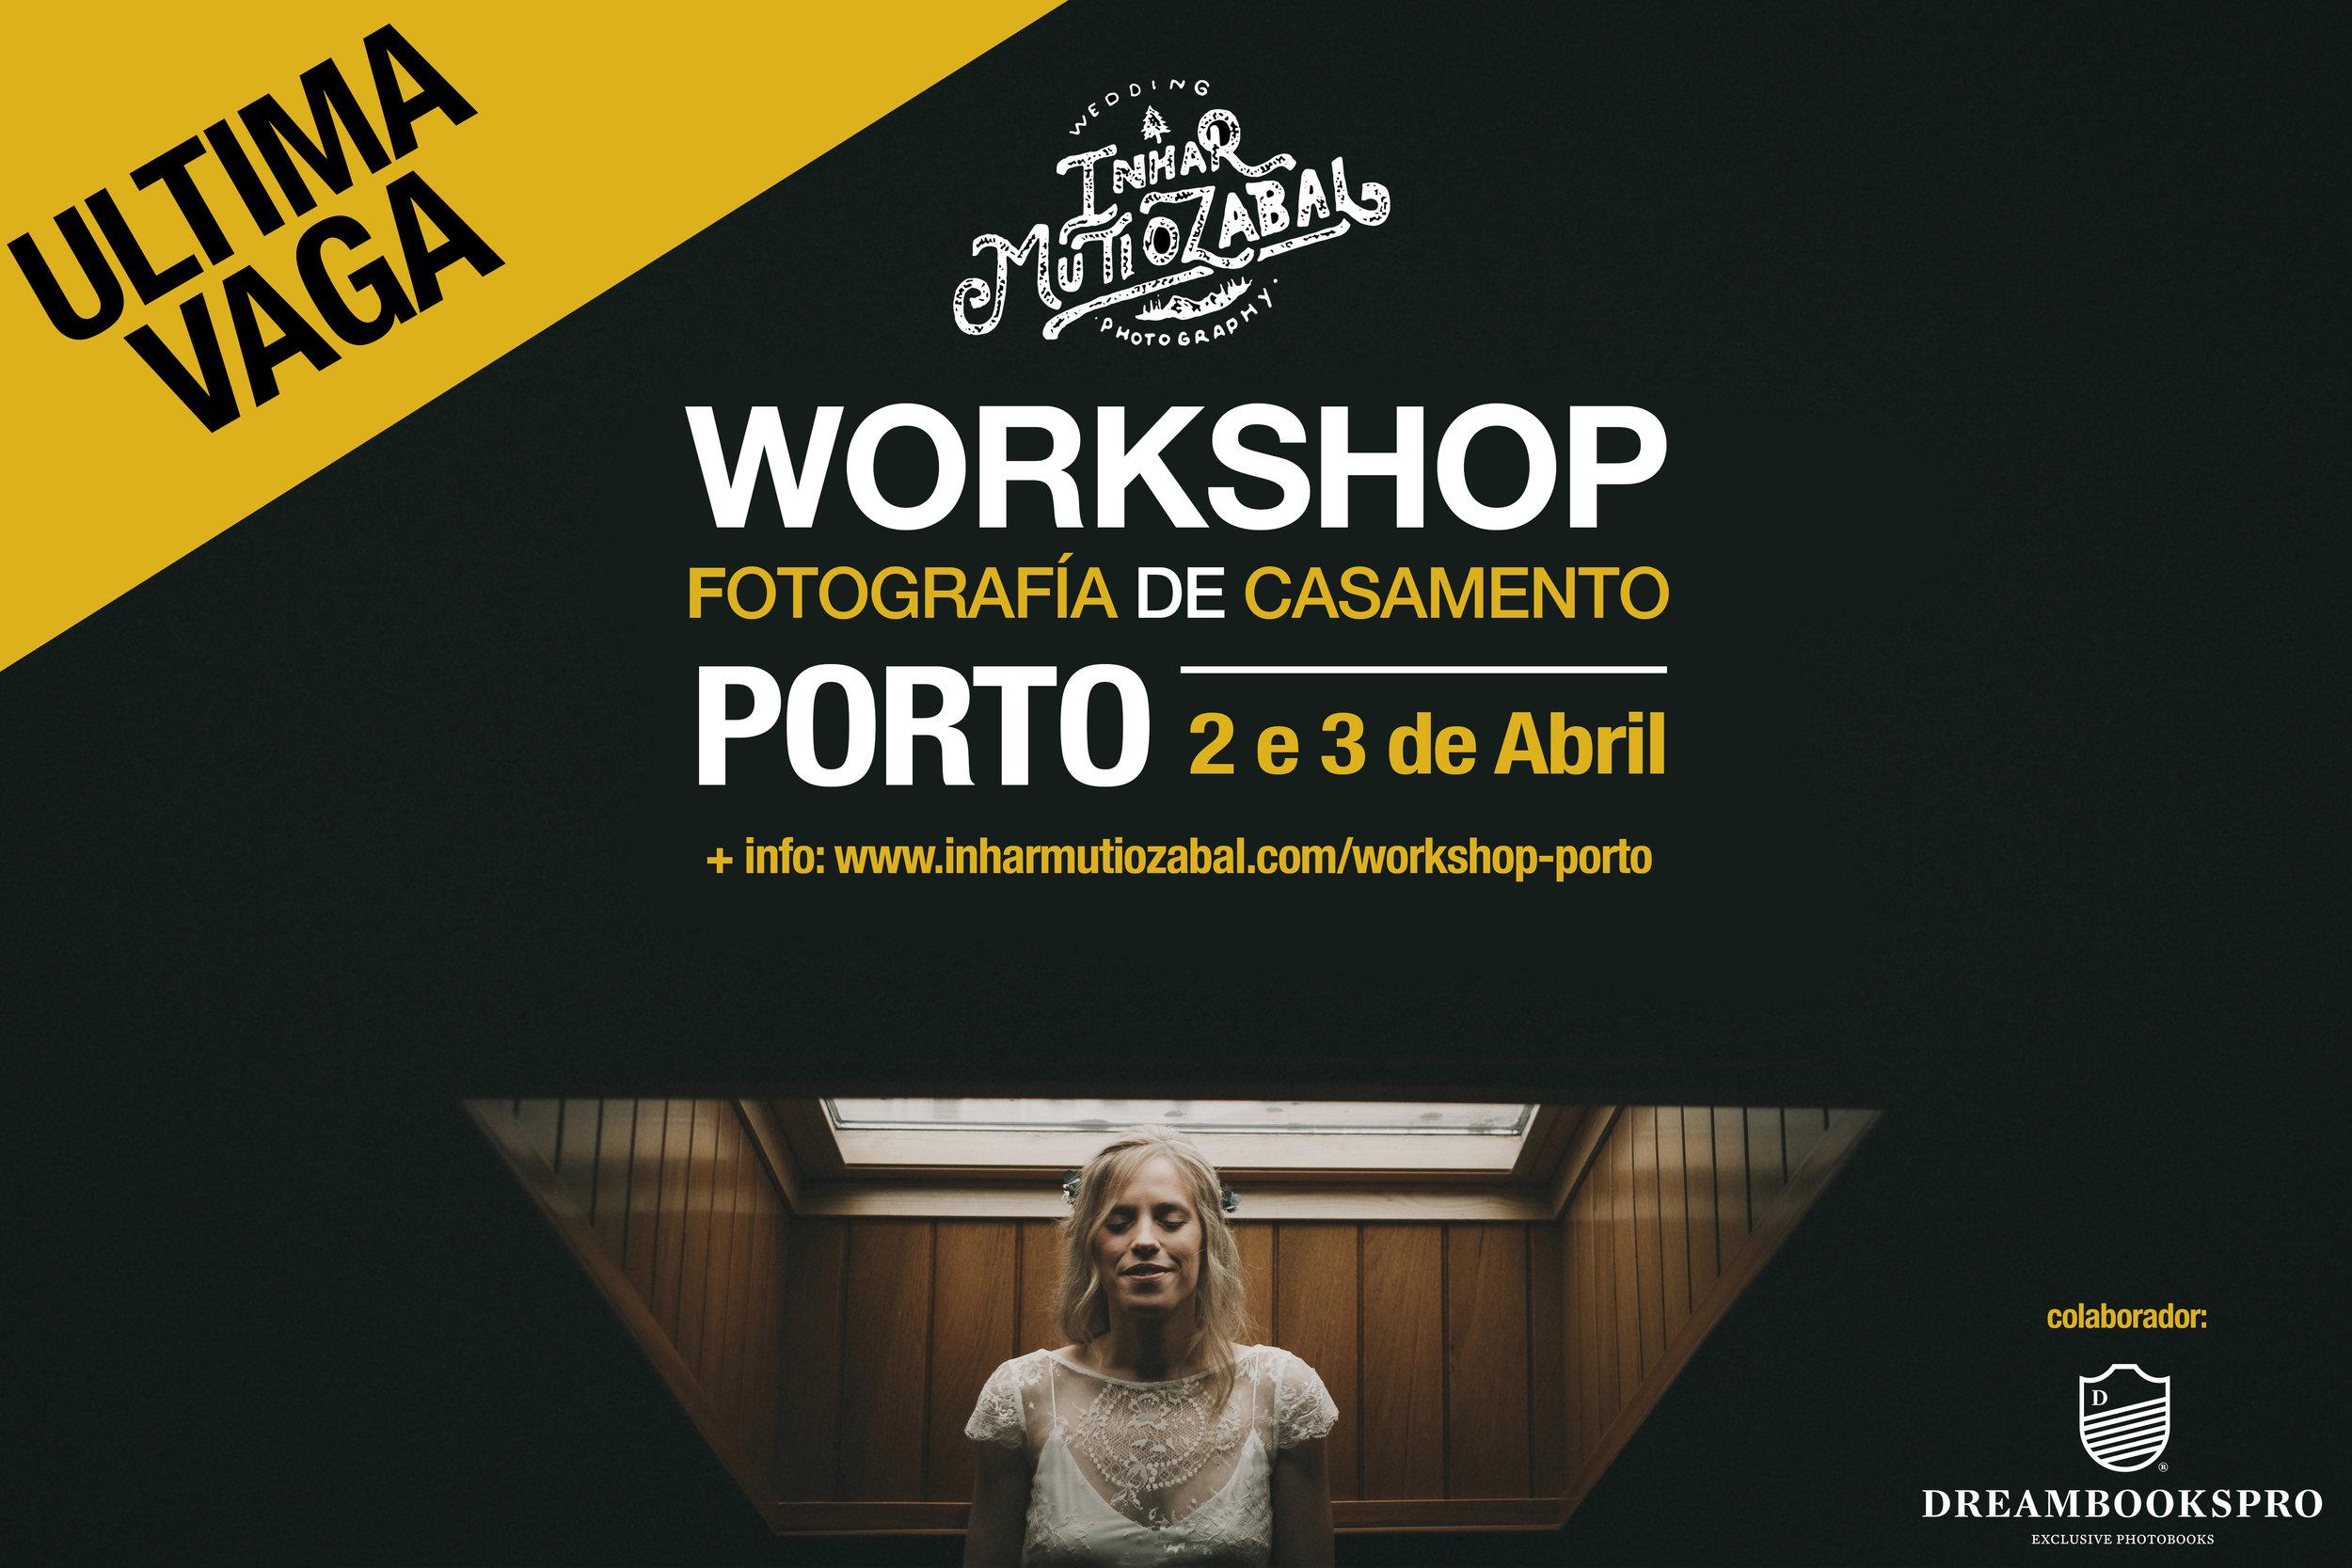 WORKSHOP FOTOGRAFÍA DE CASAMENTO - PORTO2 e 3 de Abril de 2019